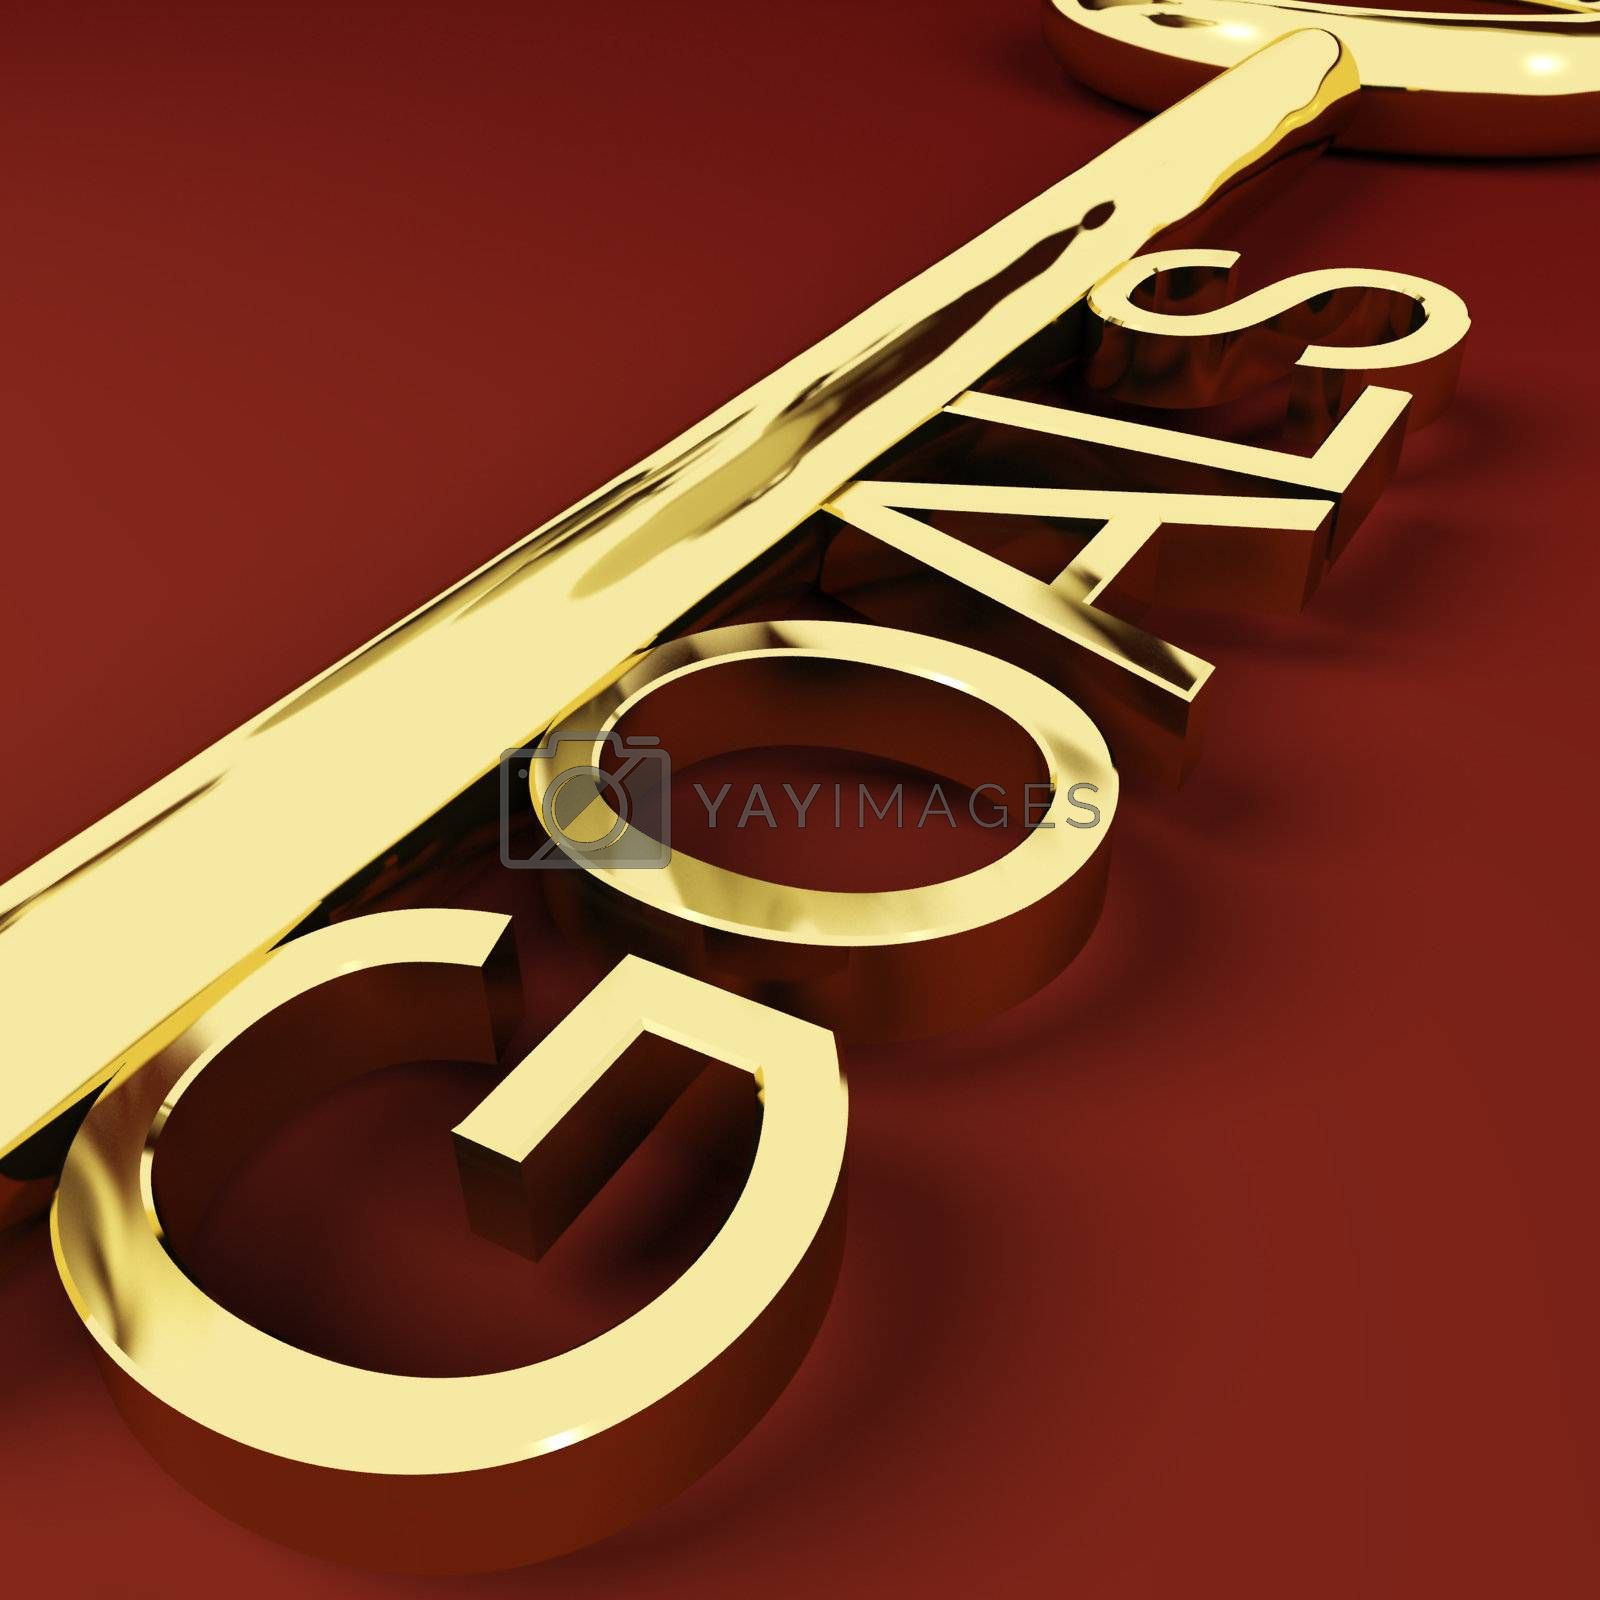 Goals Gold Key Representing Aspirations And Intent